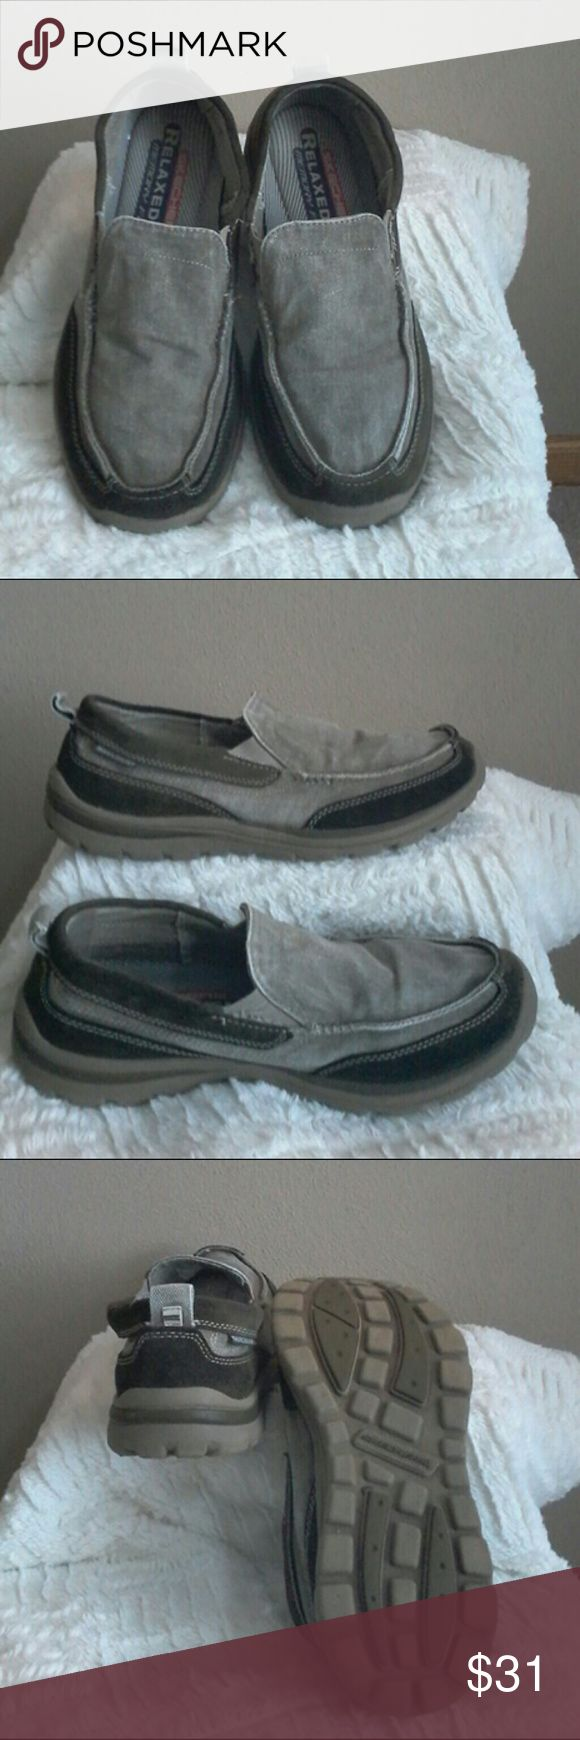 Skechers Men's shoes Relaxed Fit Memory Foam Sketchers Shoes